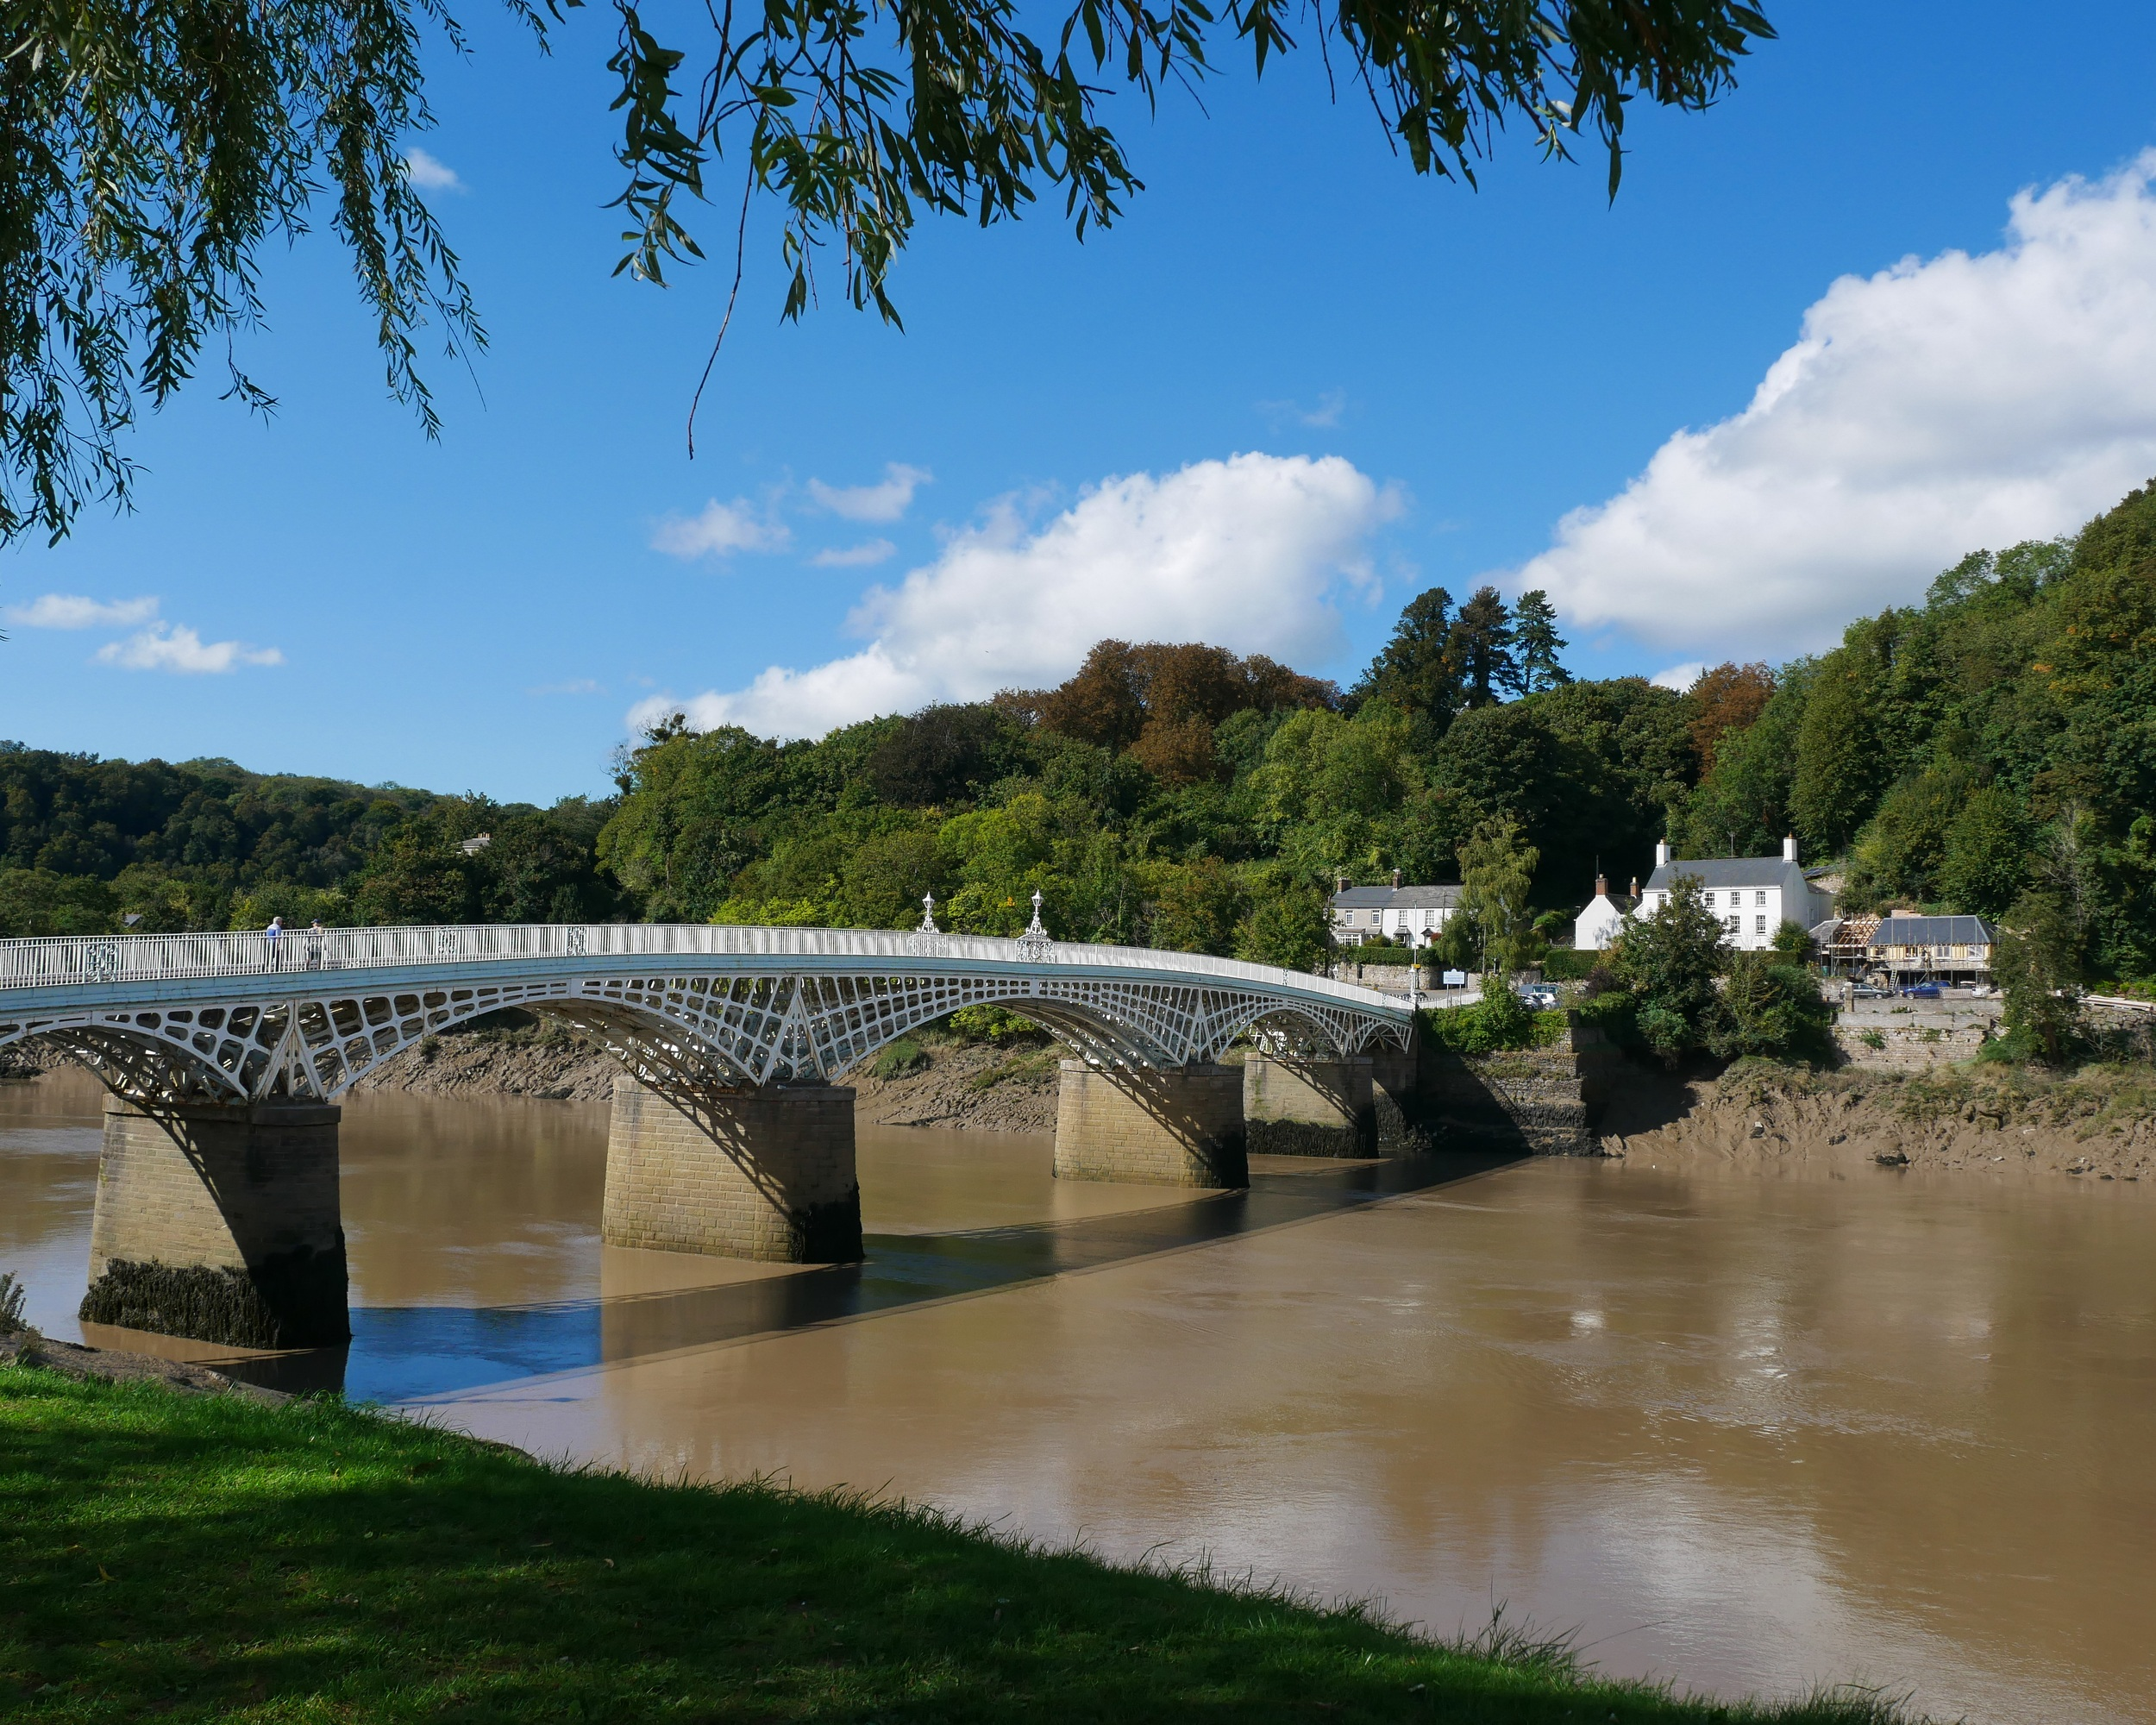 Bridge at Chepstow, Wye Valley, Wales Photo Heatheronhertravels.com